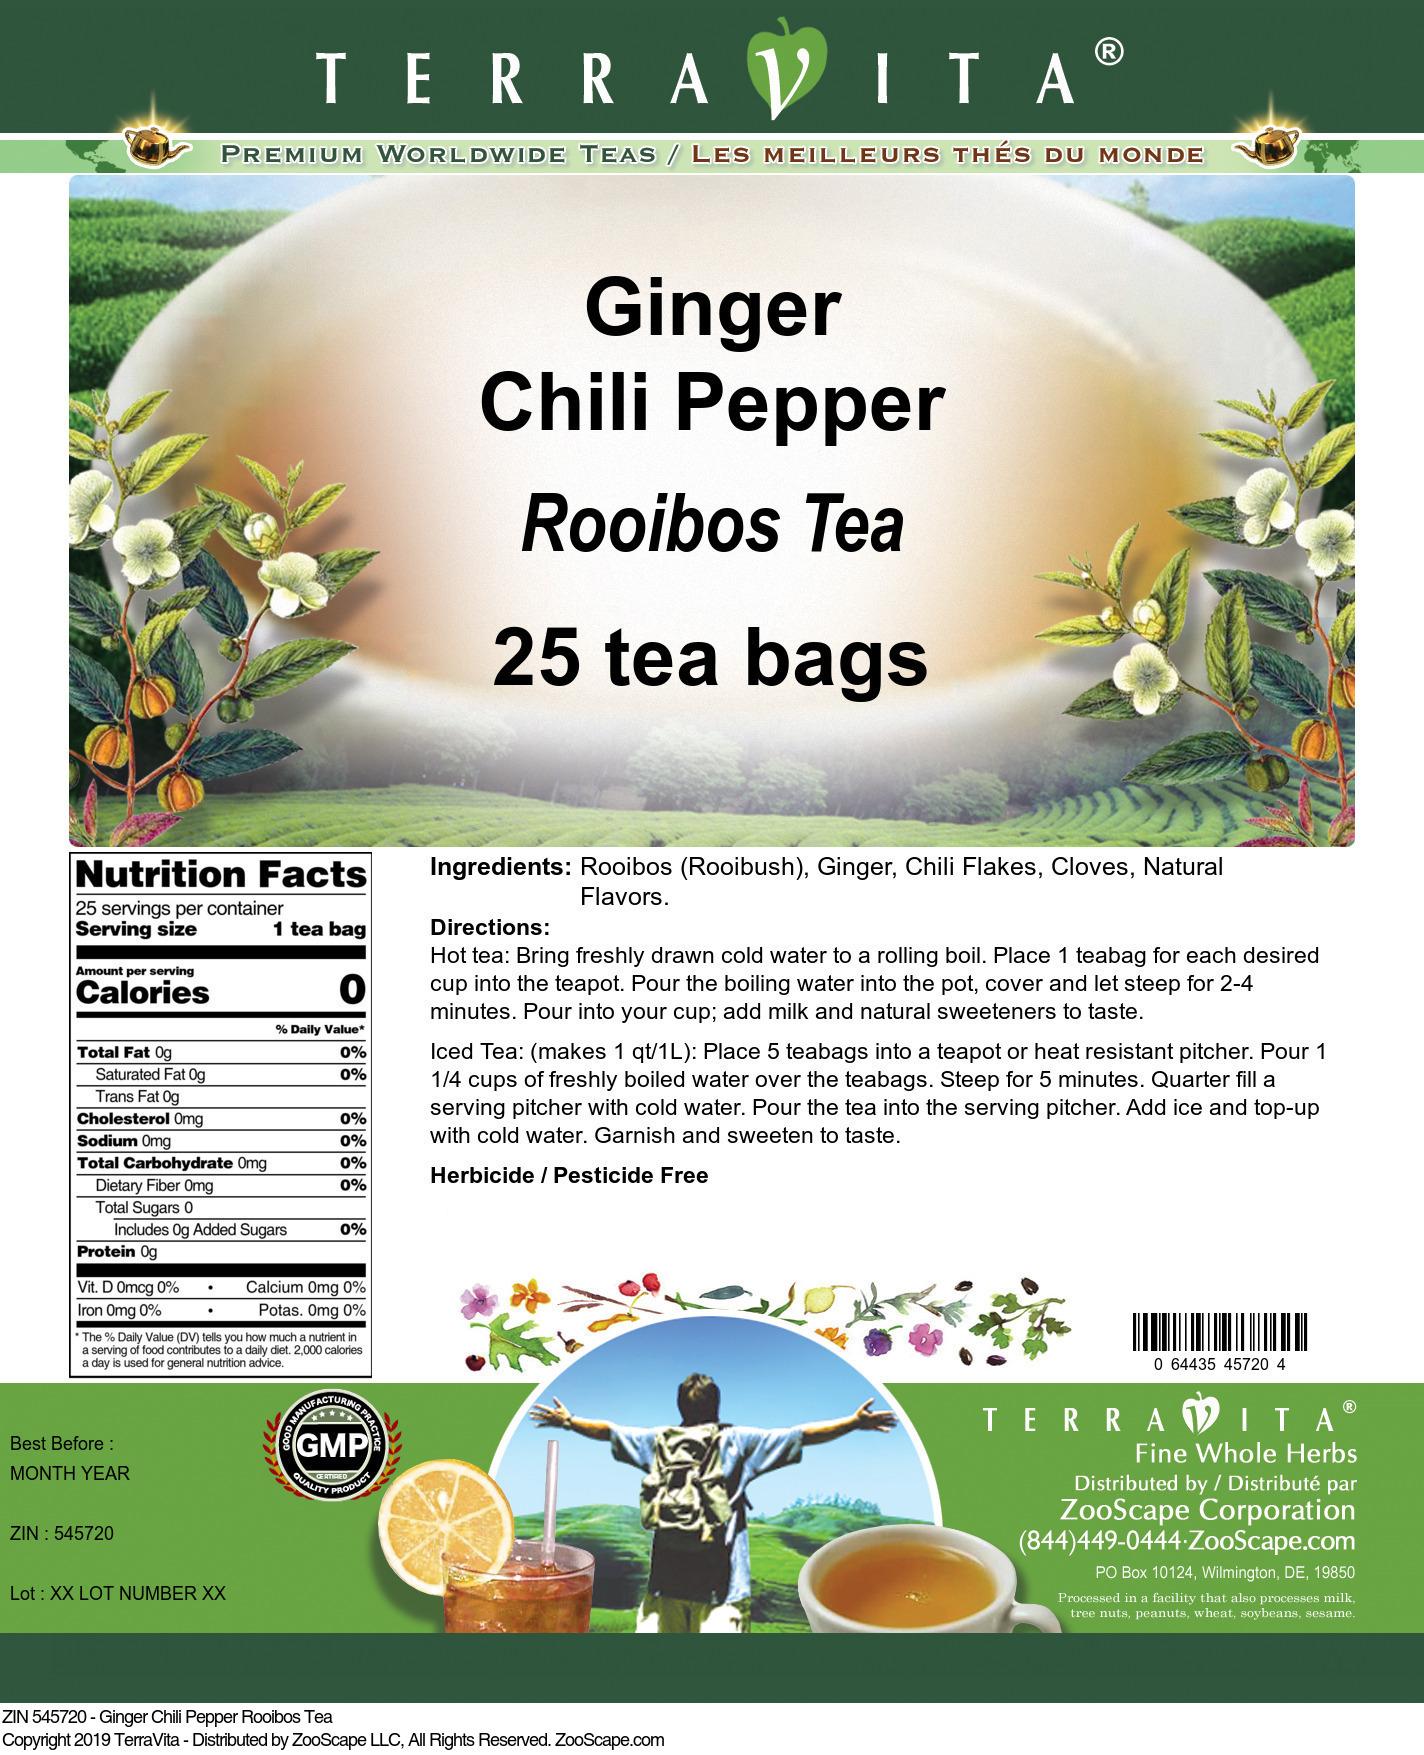 Ginger Chili Pepper Rooibos Tea